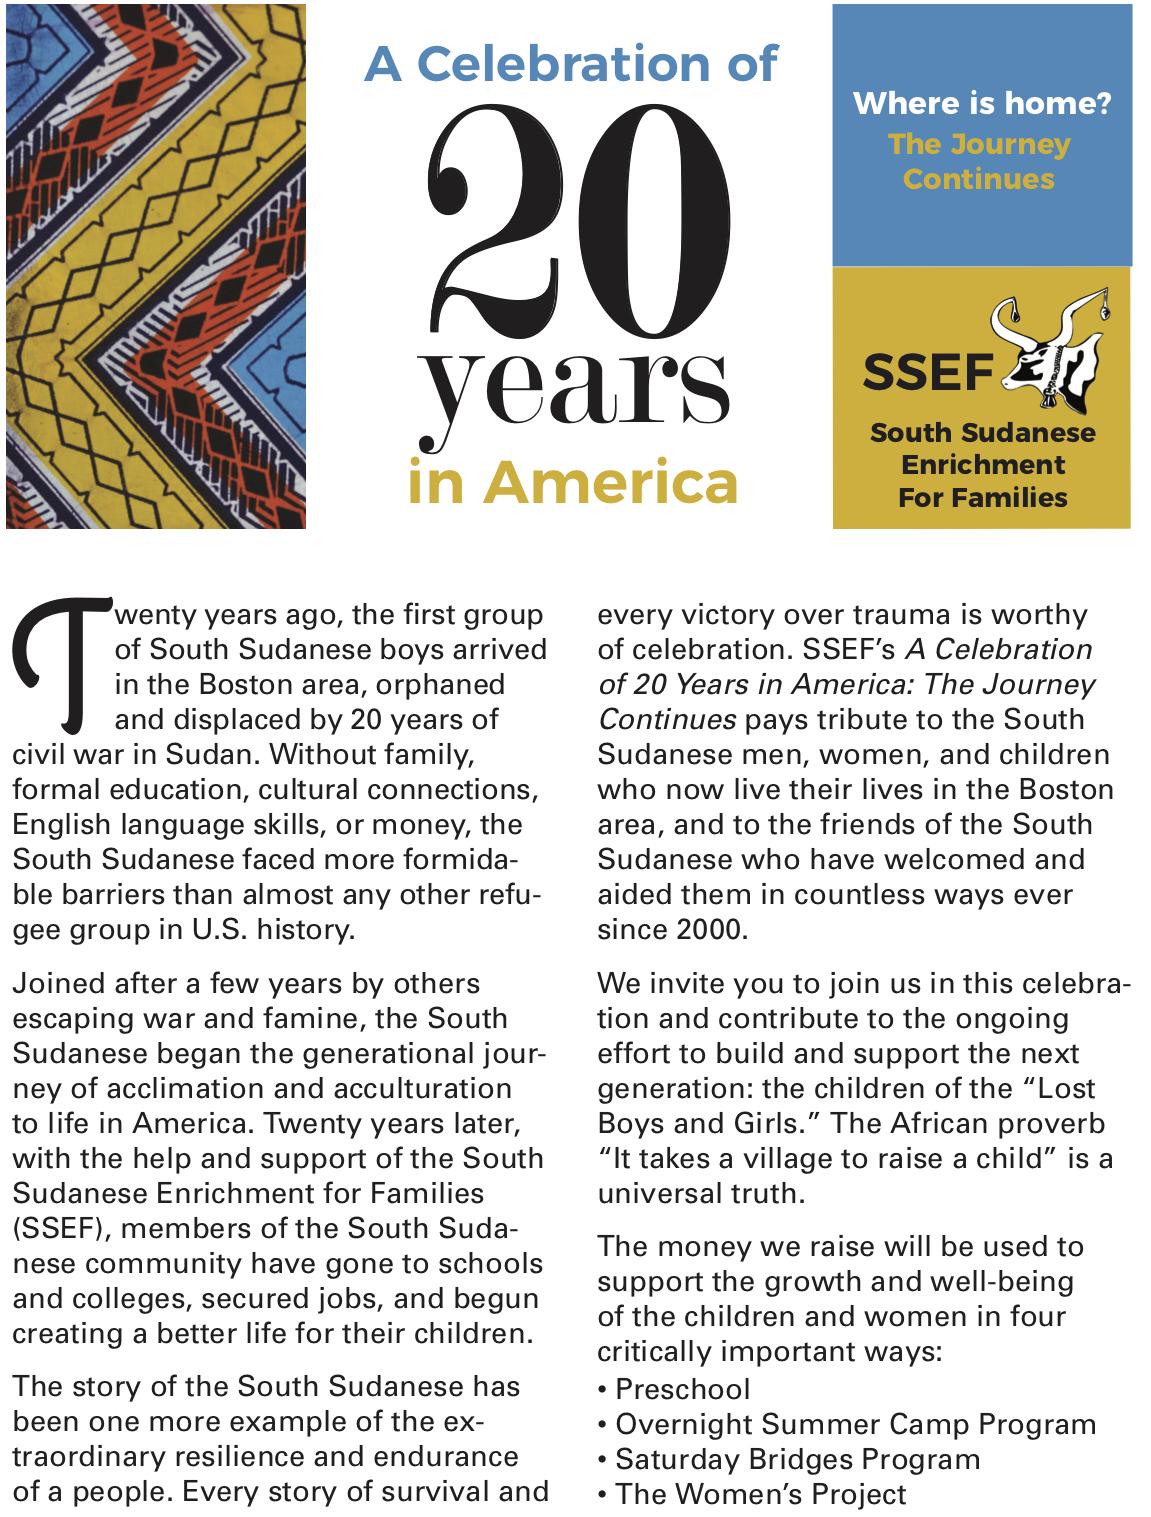 Gala2020_page1_9-6 20 Years in America.jpg